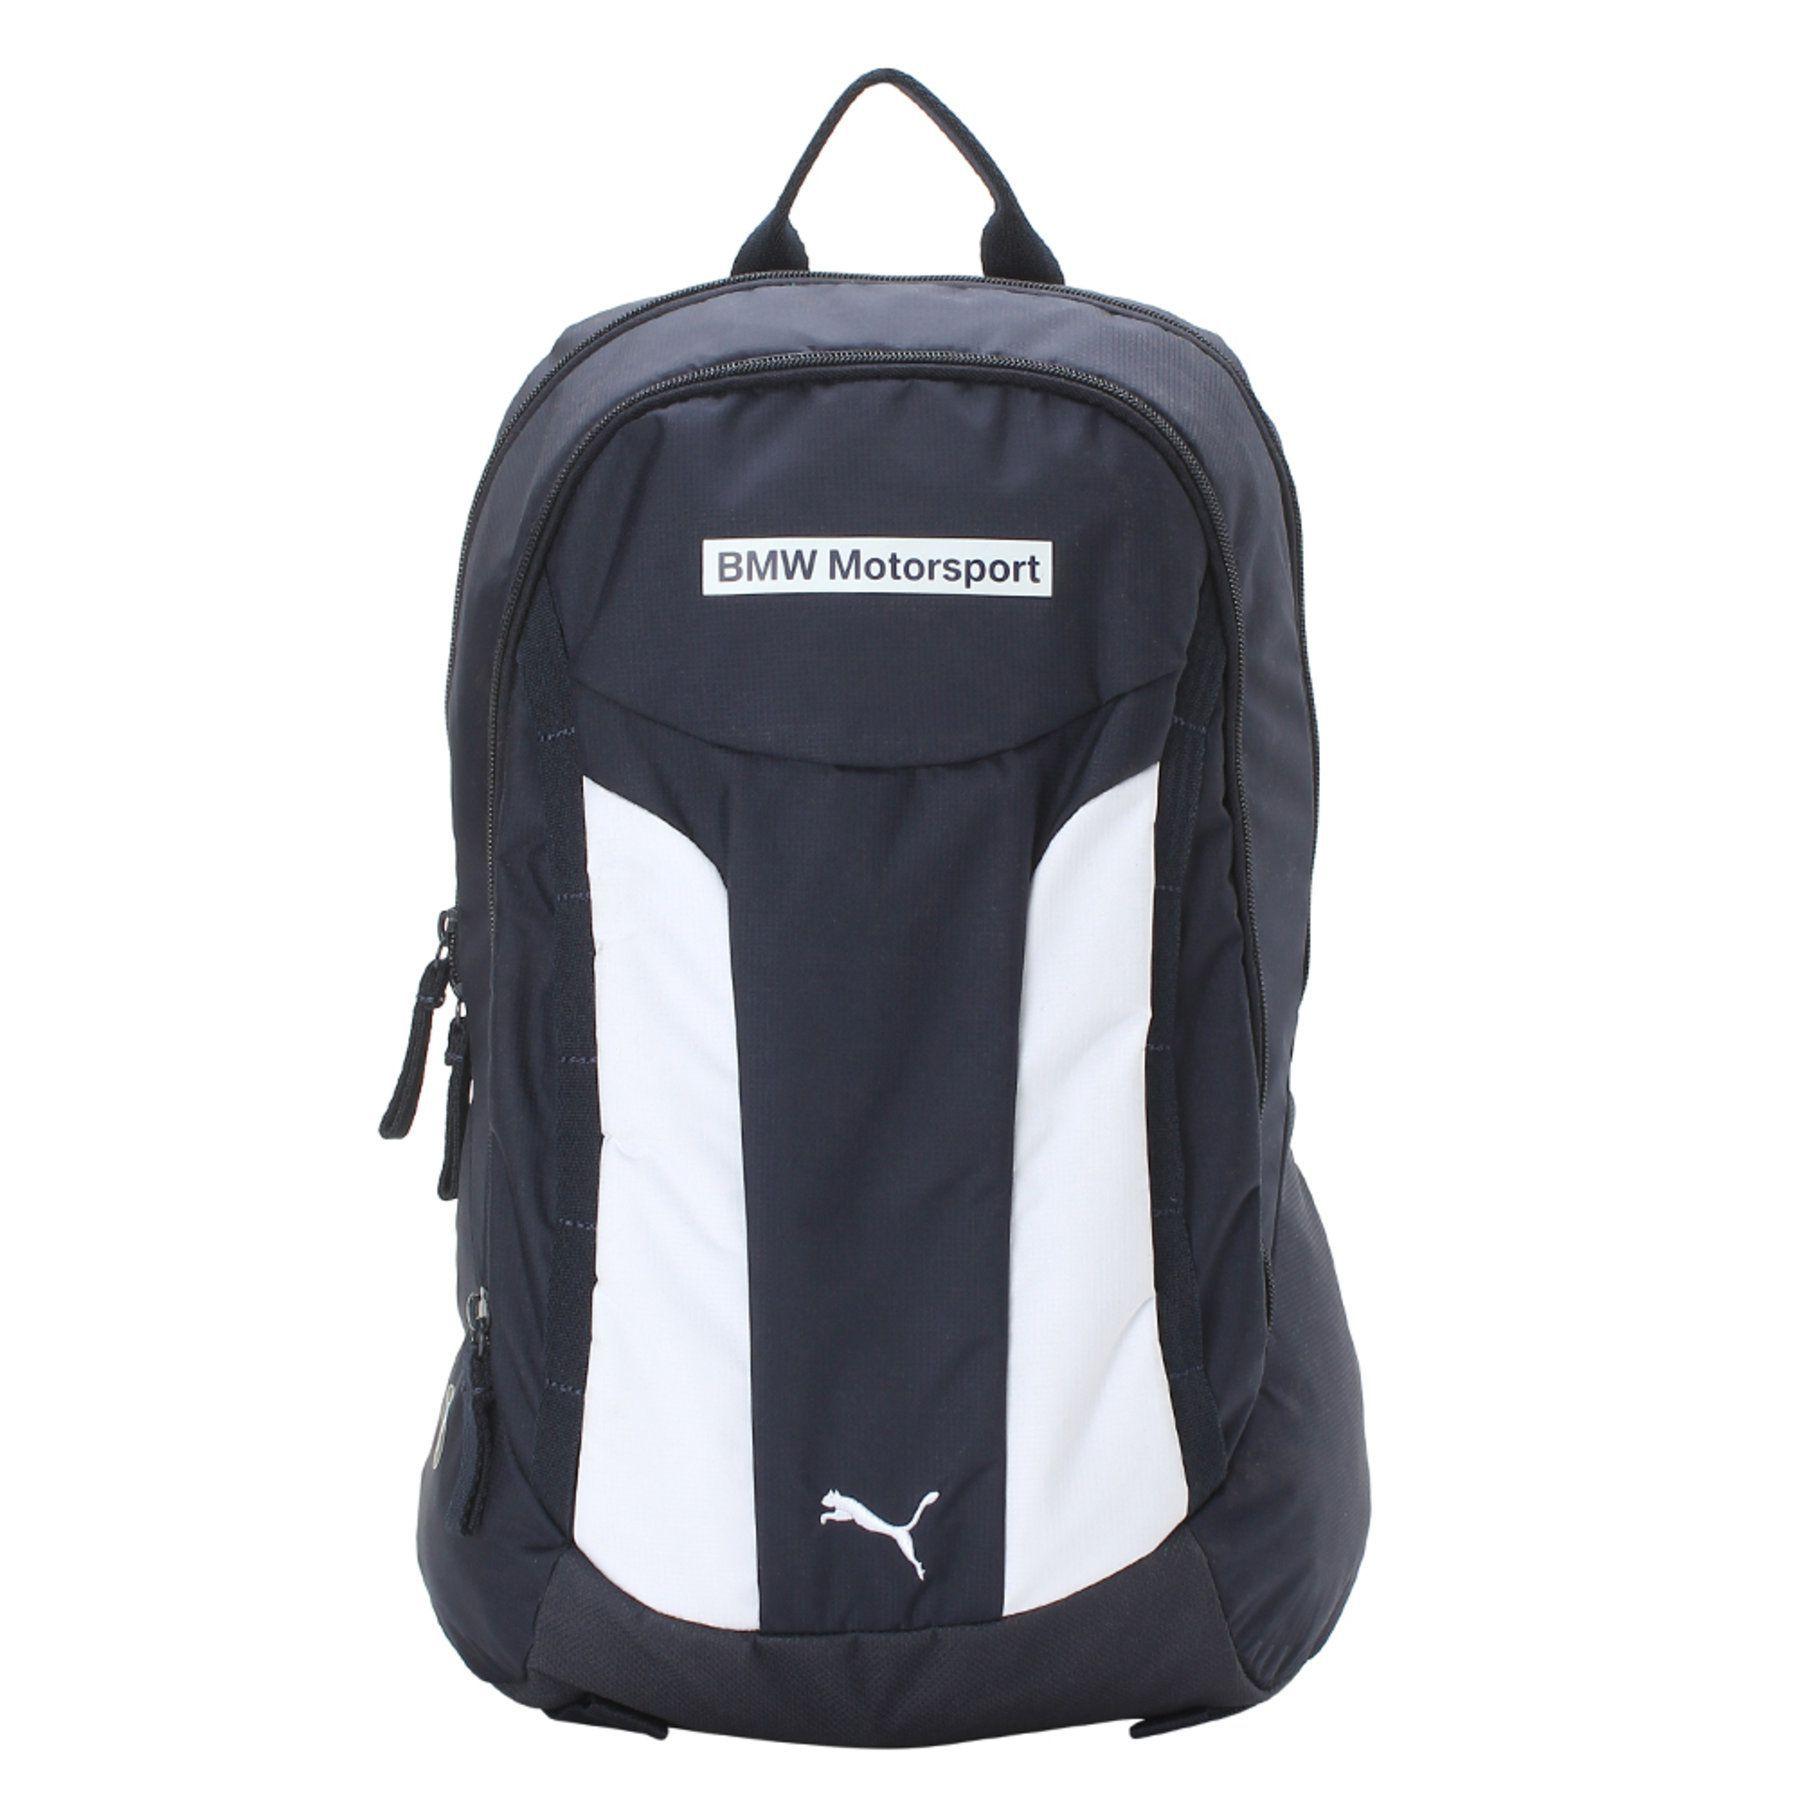 a48db7078726 Puma Navy Motorsport Backpack - Buy Puma Navy Motorsport Backpack Online at  Low Price - Snapdeal